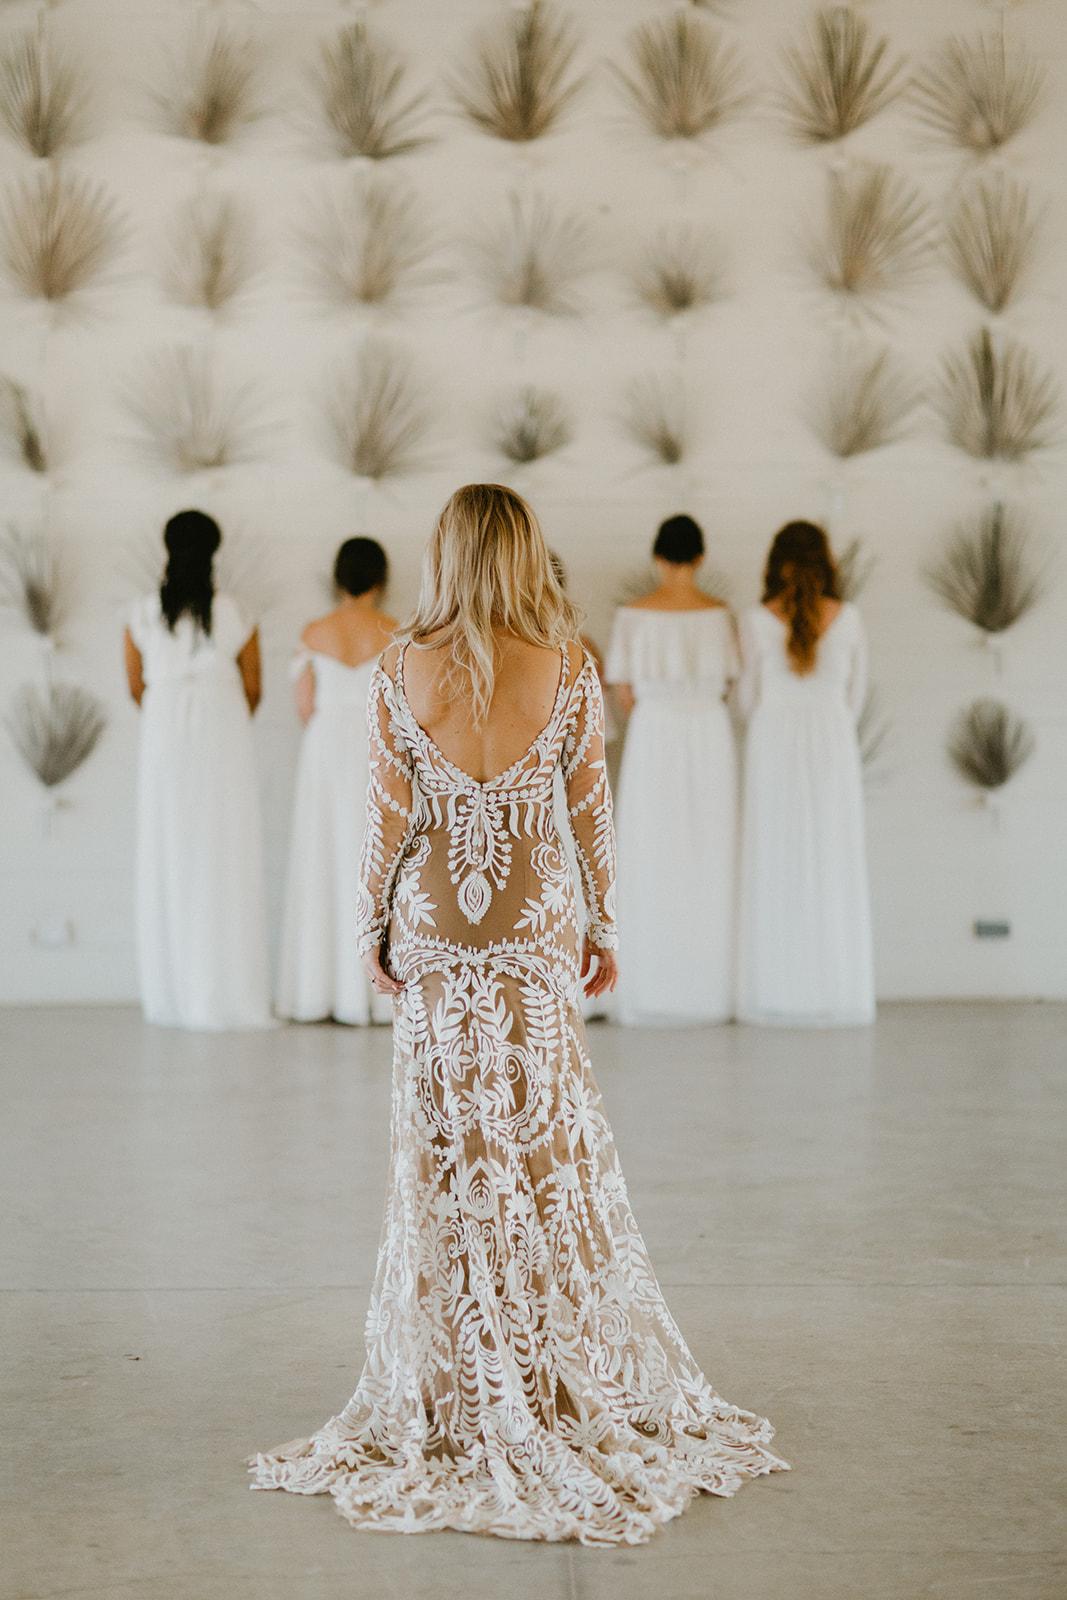 bridesmaids first look images + rue de seine wedding dress nude lining + prospect house dripping springs austin wedding venue + wedding planner epoch co